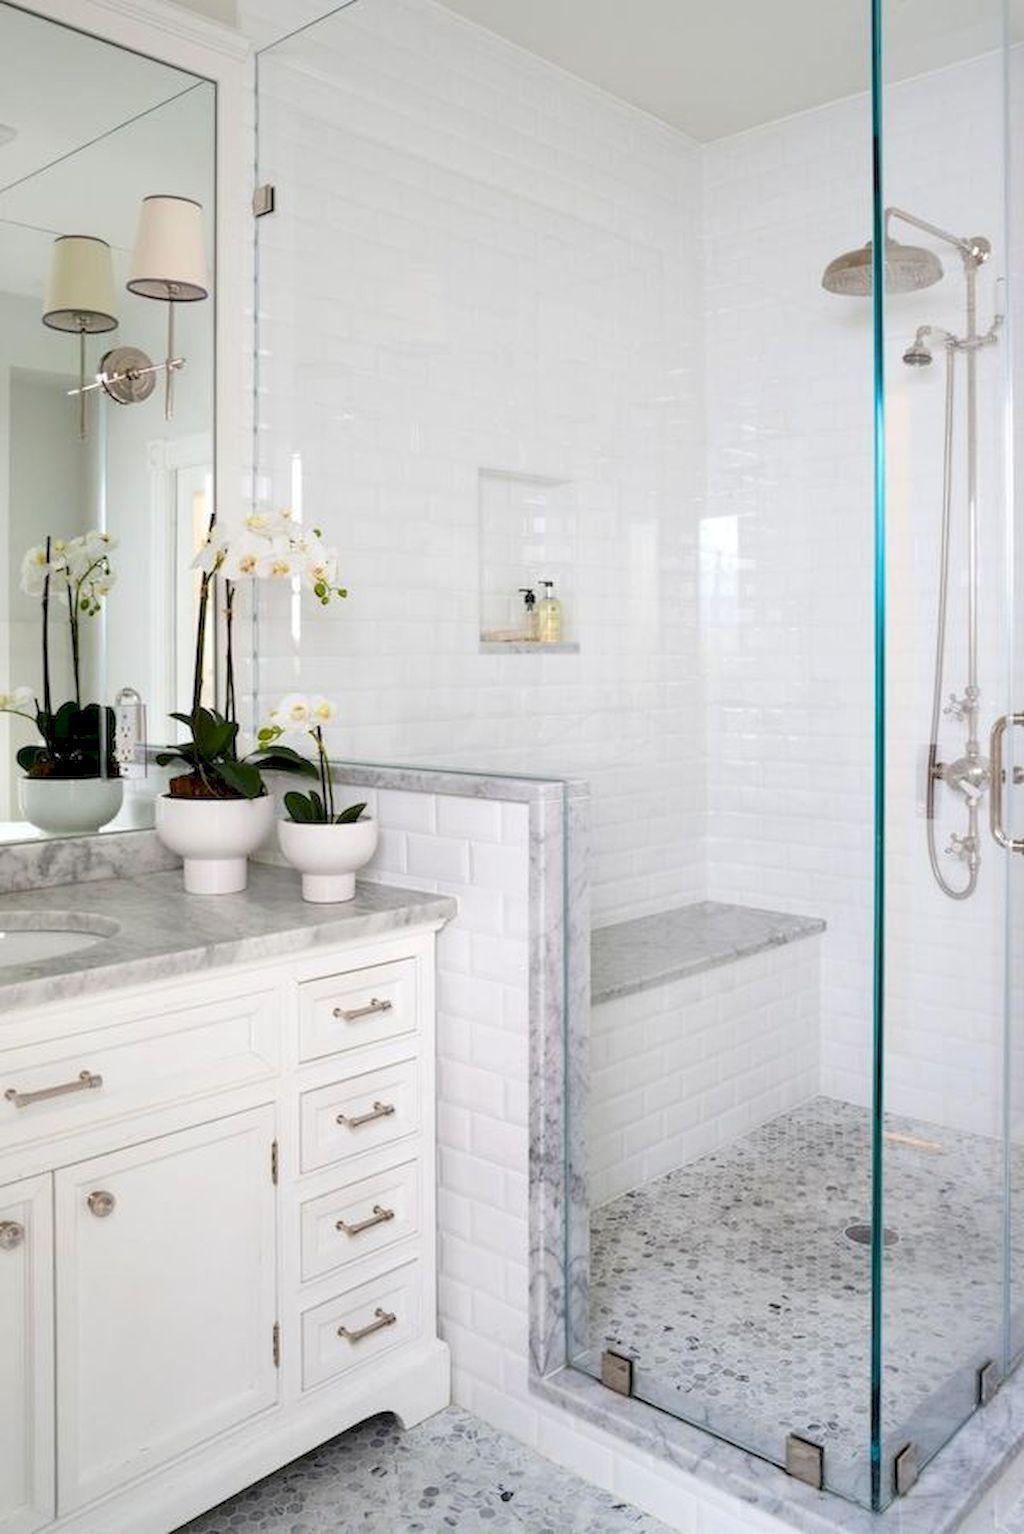 55 Cool Small Master Bathroom Remodel Ideas   Master bathroom ...